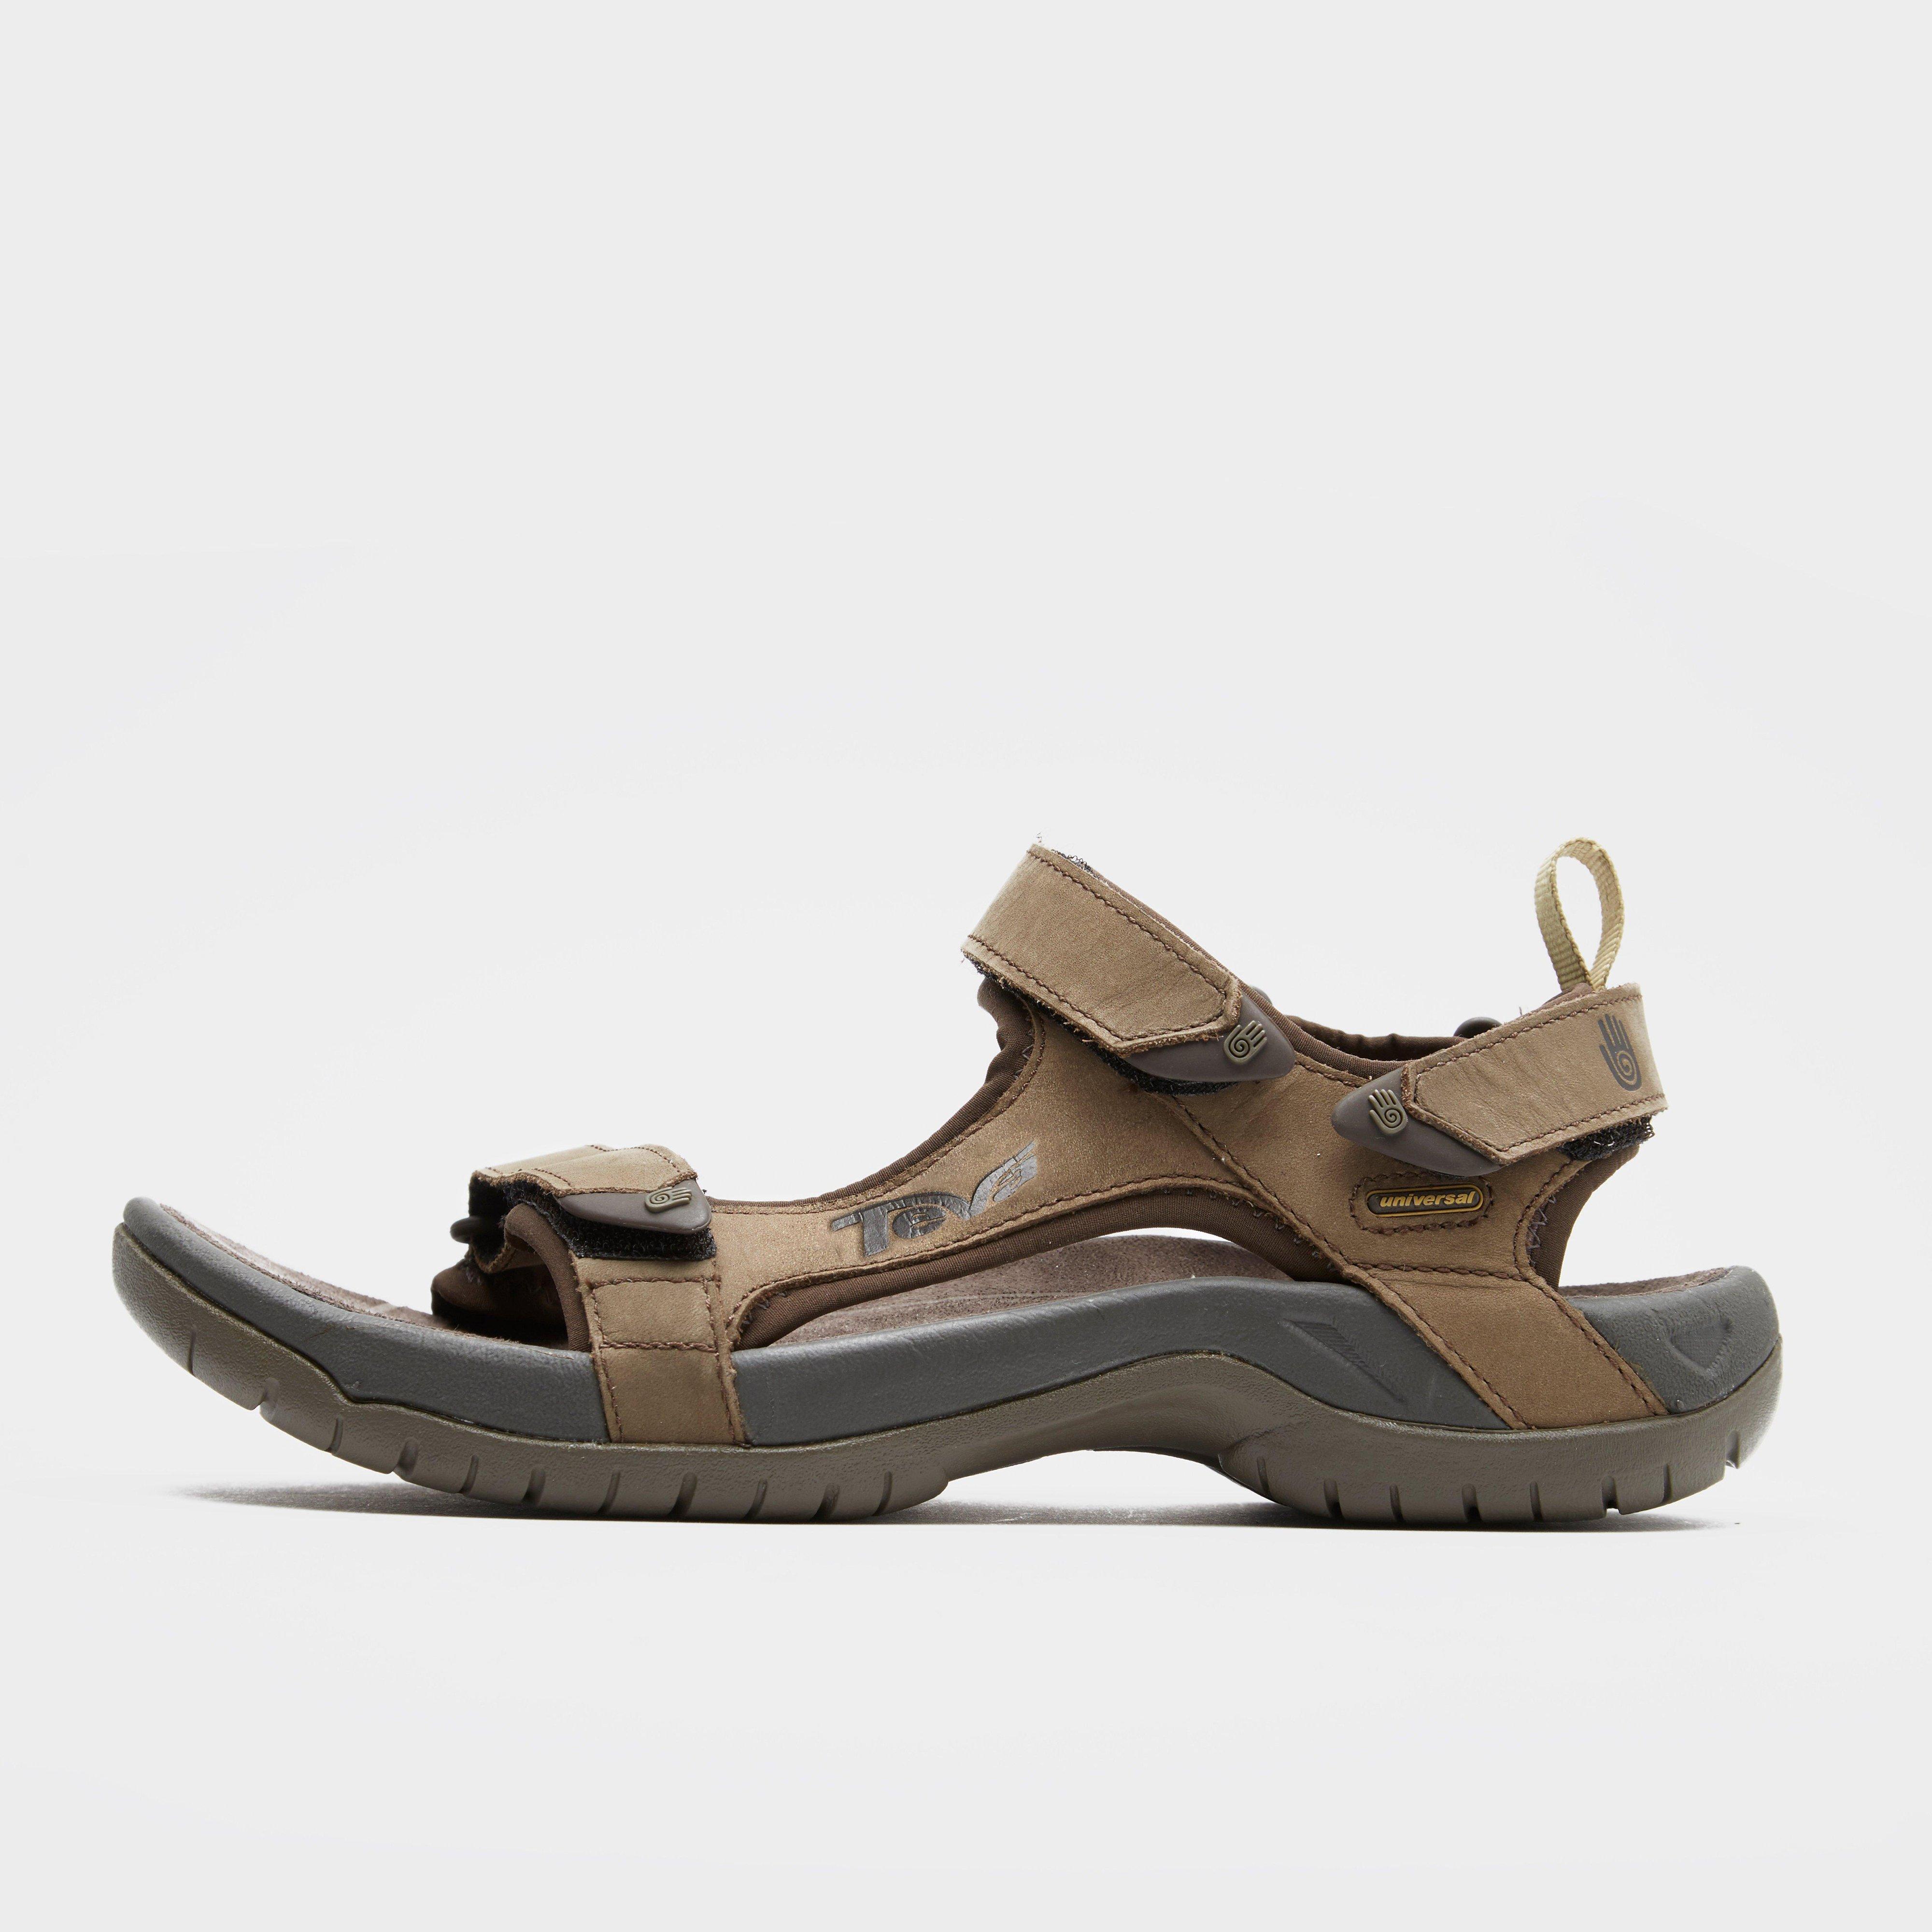 88f552d8092f Brown TEVA Men s Tanza Leather Sandal image 1